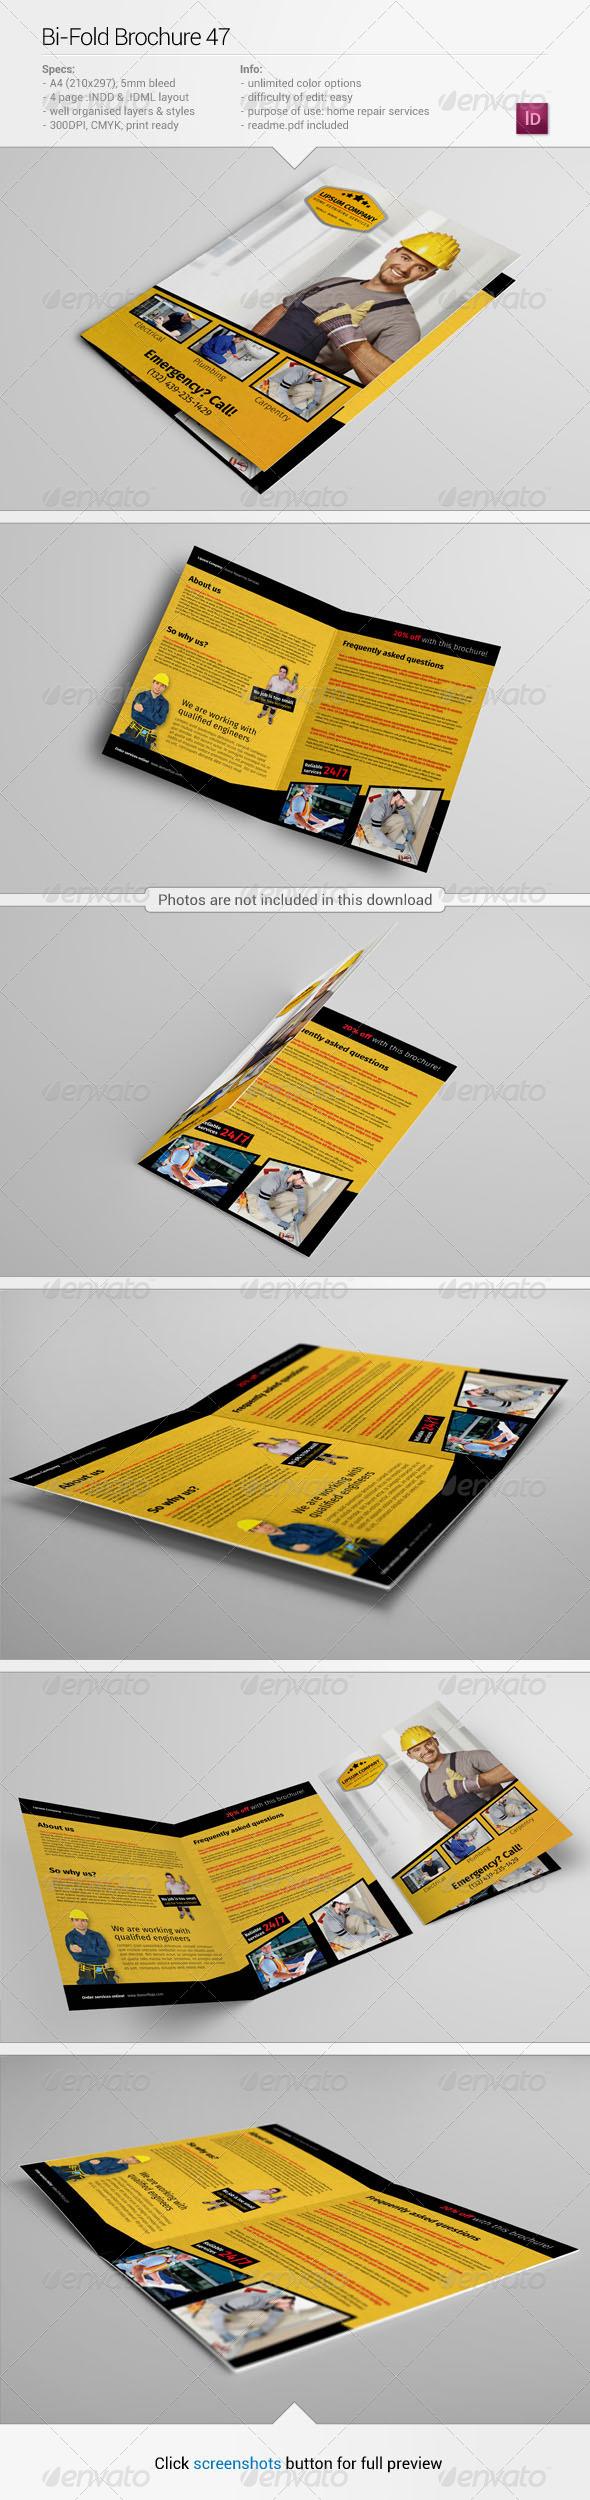 Bi-Fold Brochure 47 - Informational Brochures